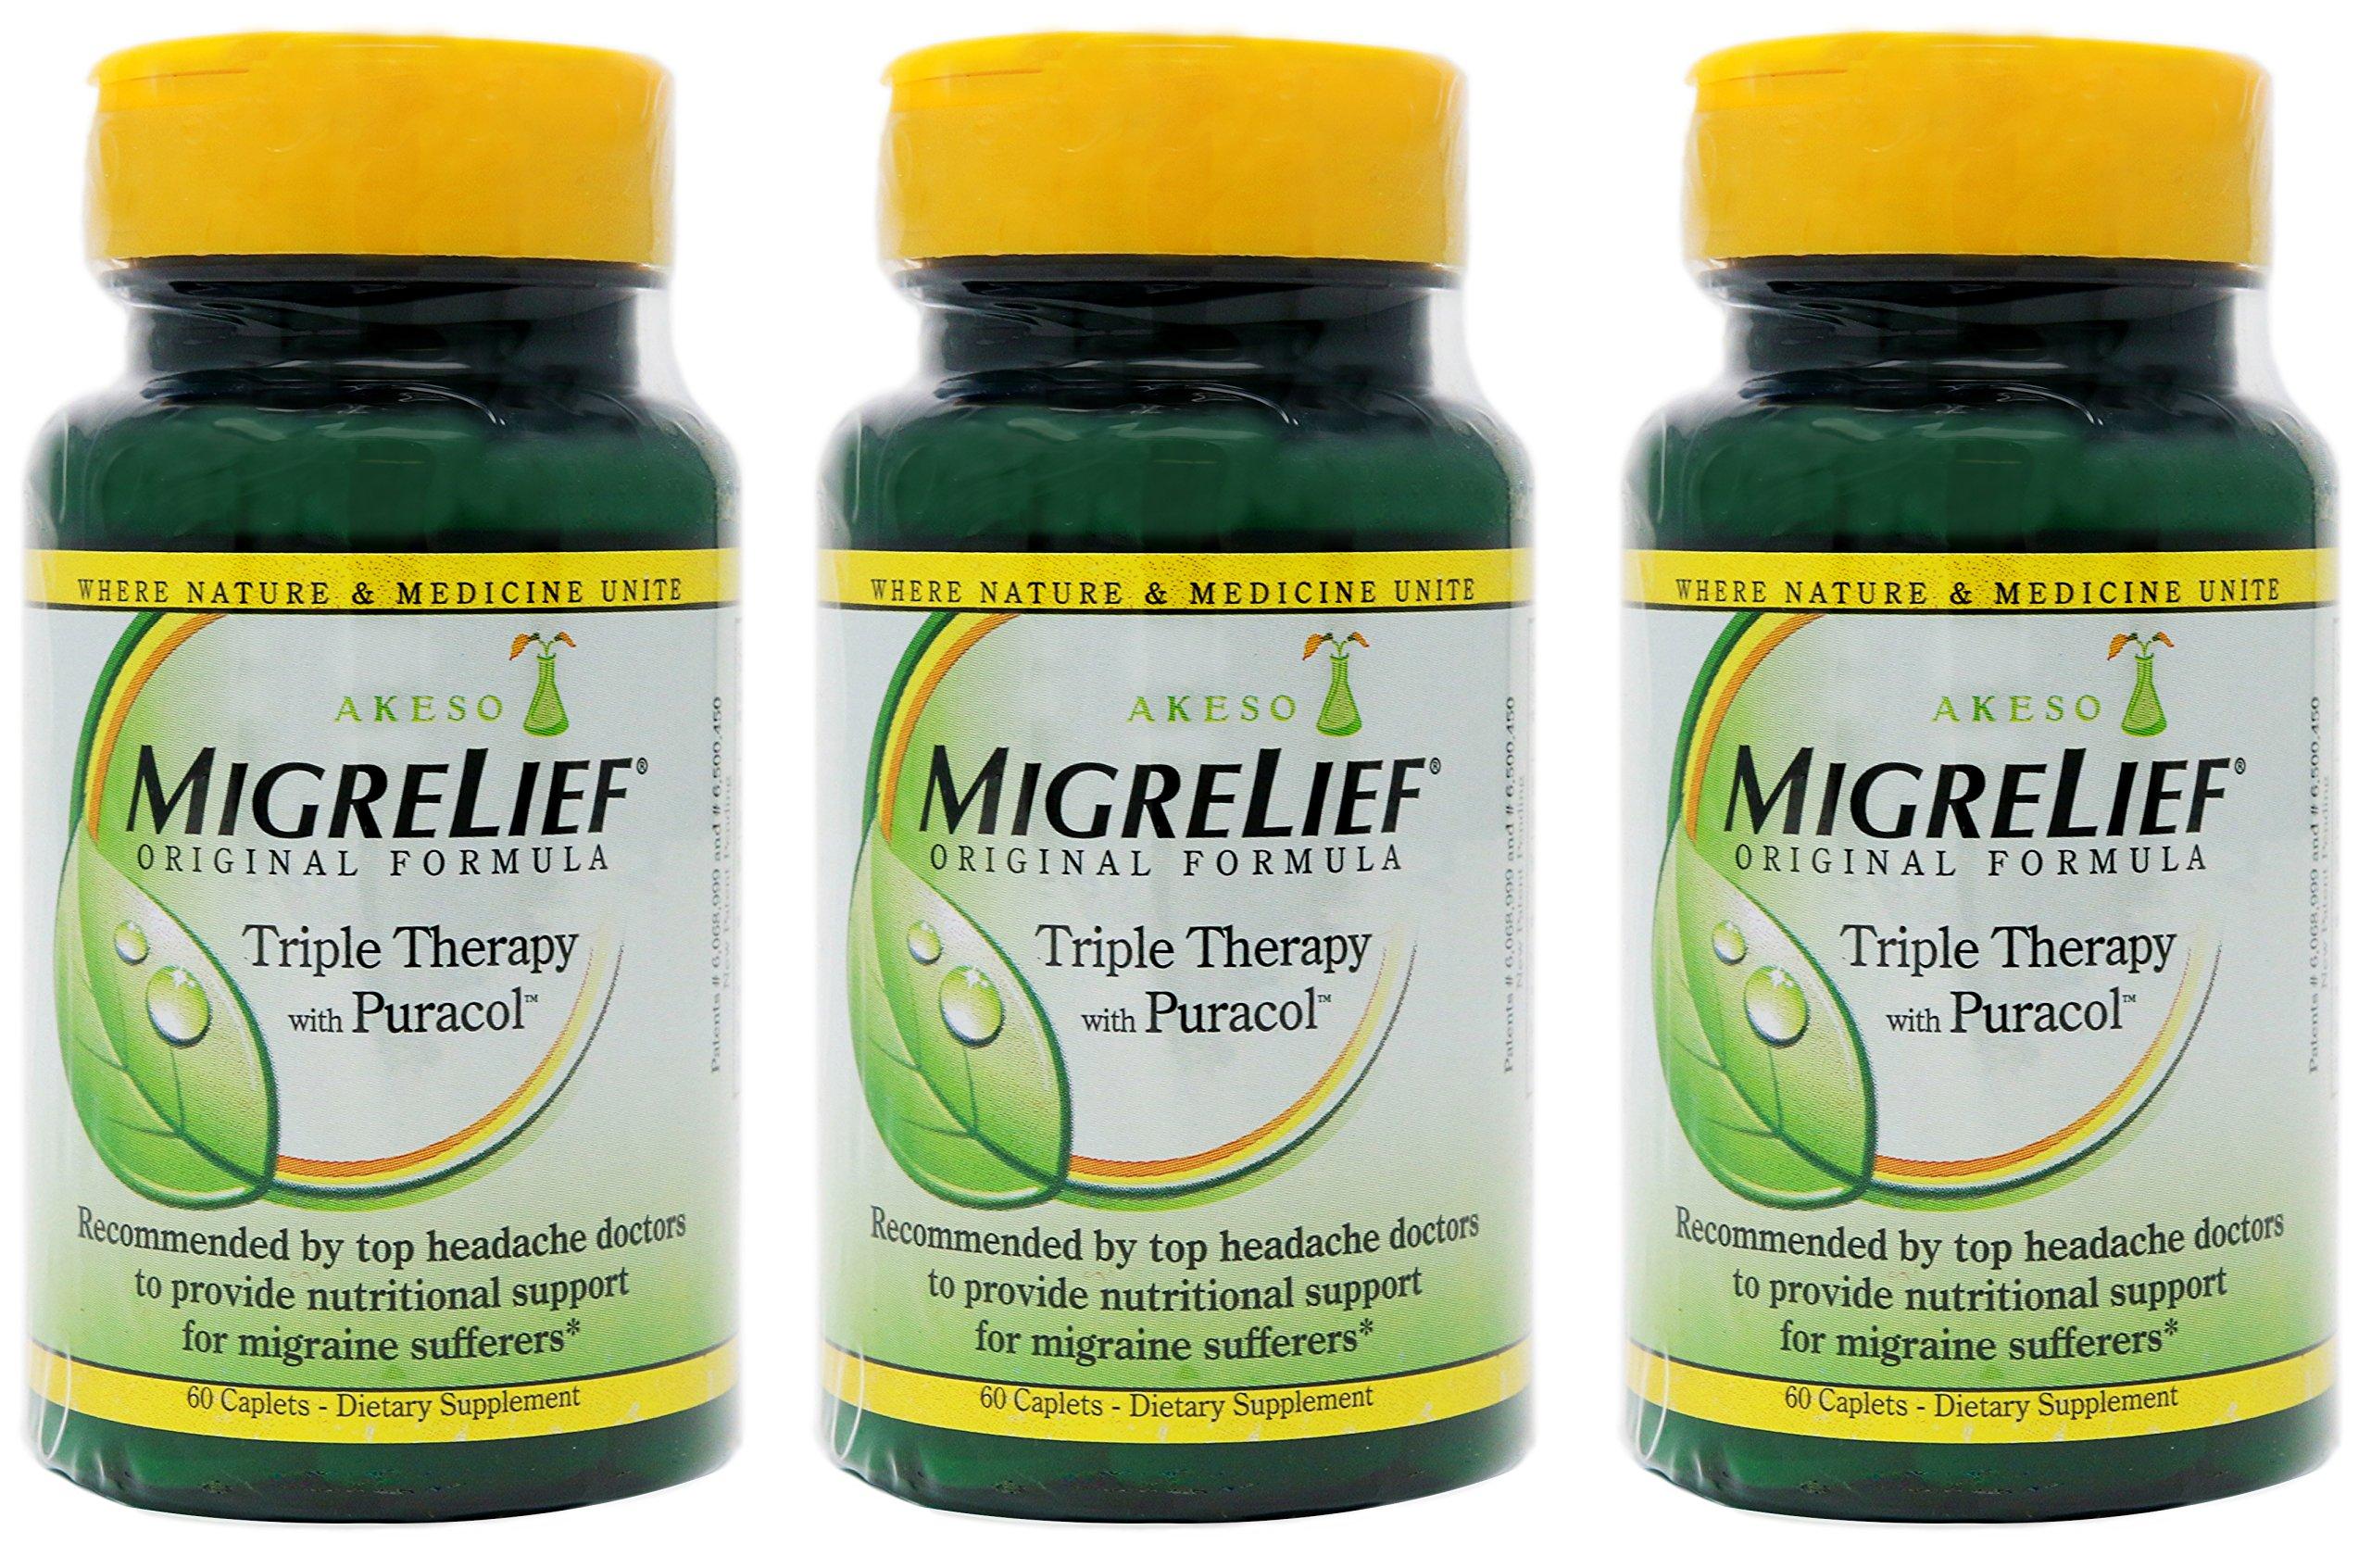 MigreLief Original Formula Triple Therapy with Puracol, 60 Count (Pack of 3) by MigreLief Original Formula